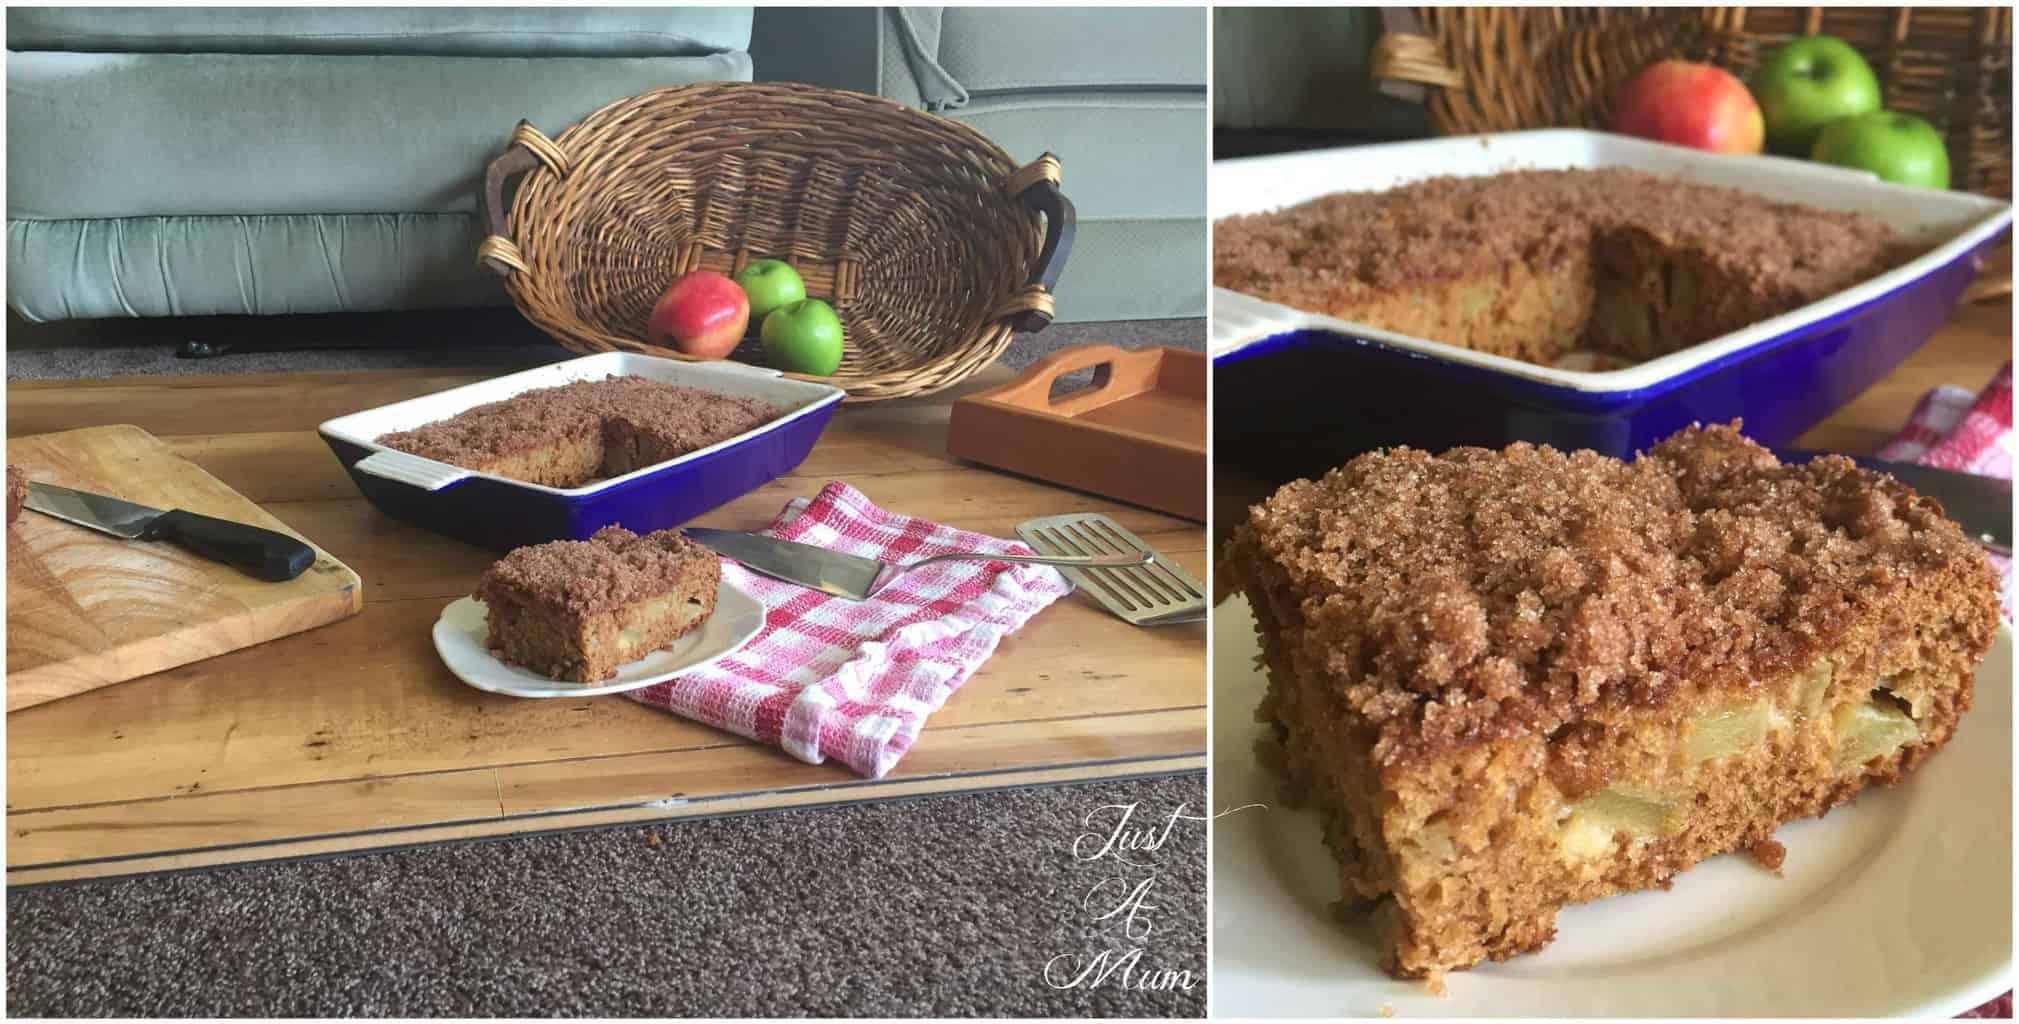 Behind the Scenes - Apple Cinnamon Cake